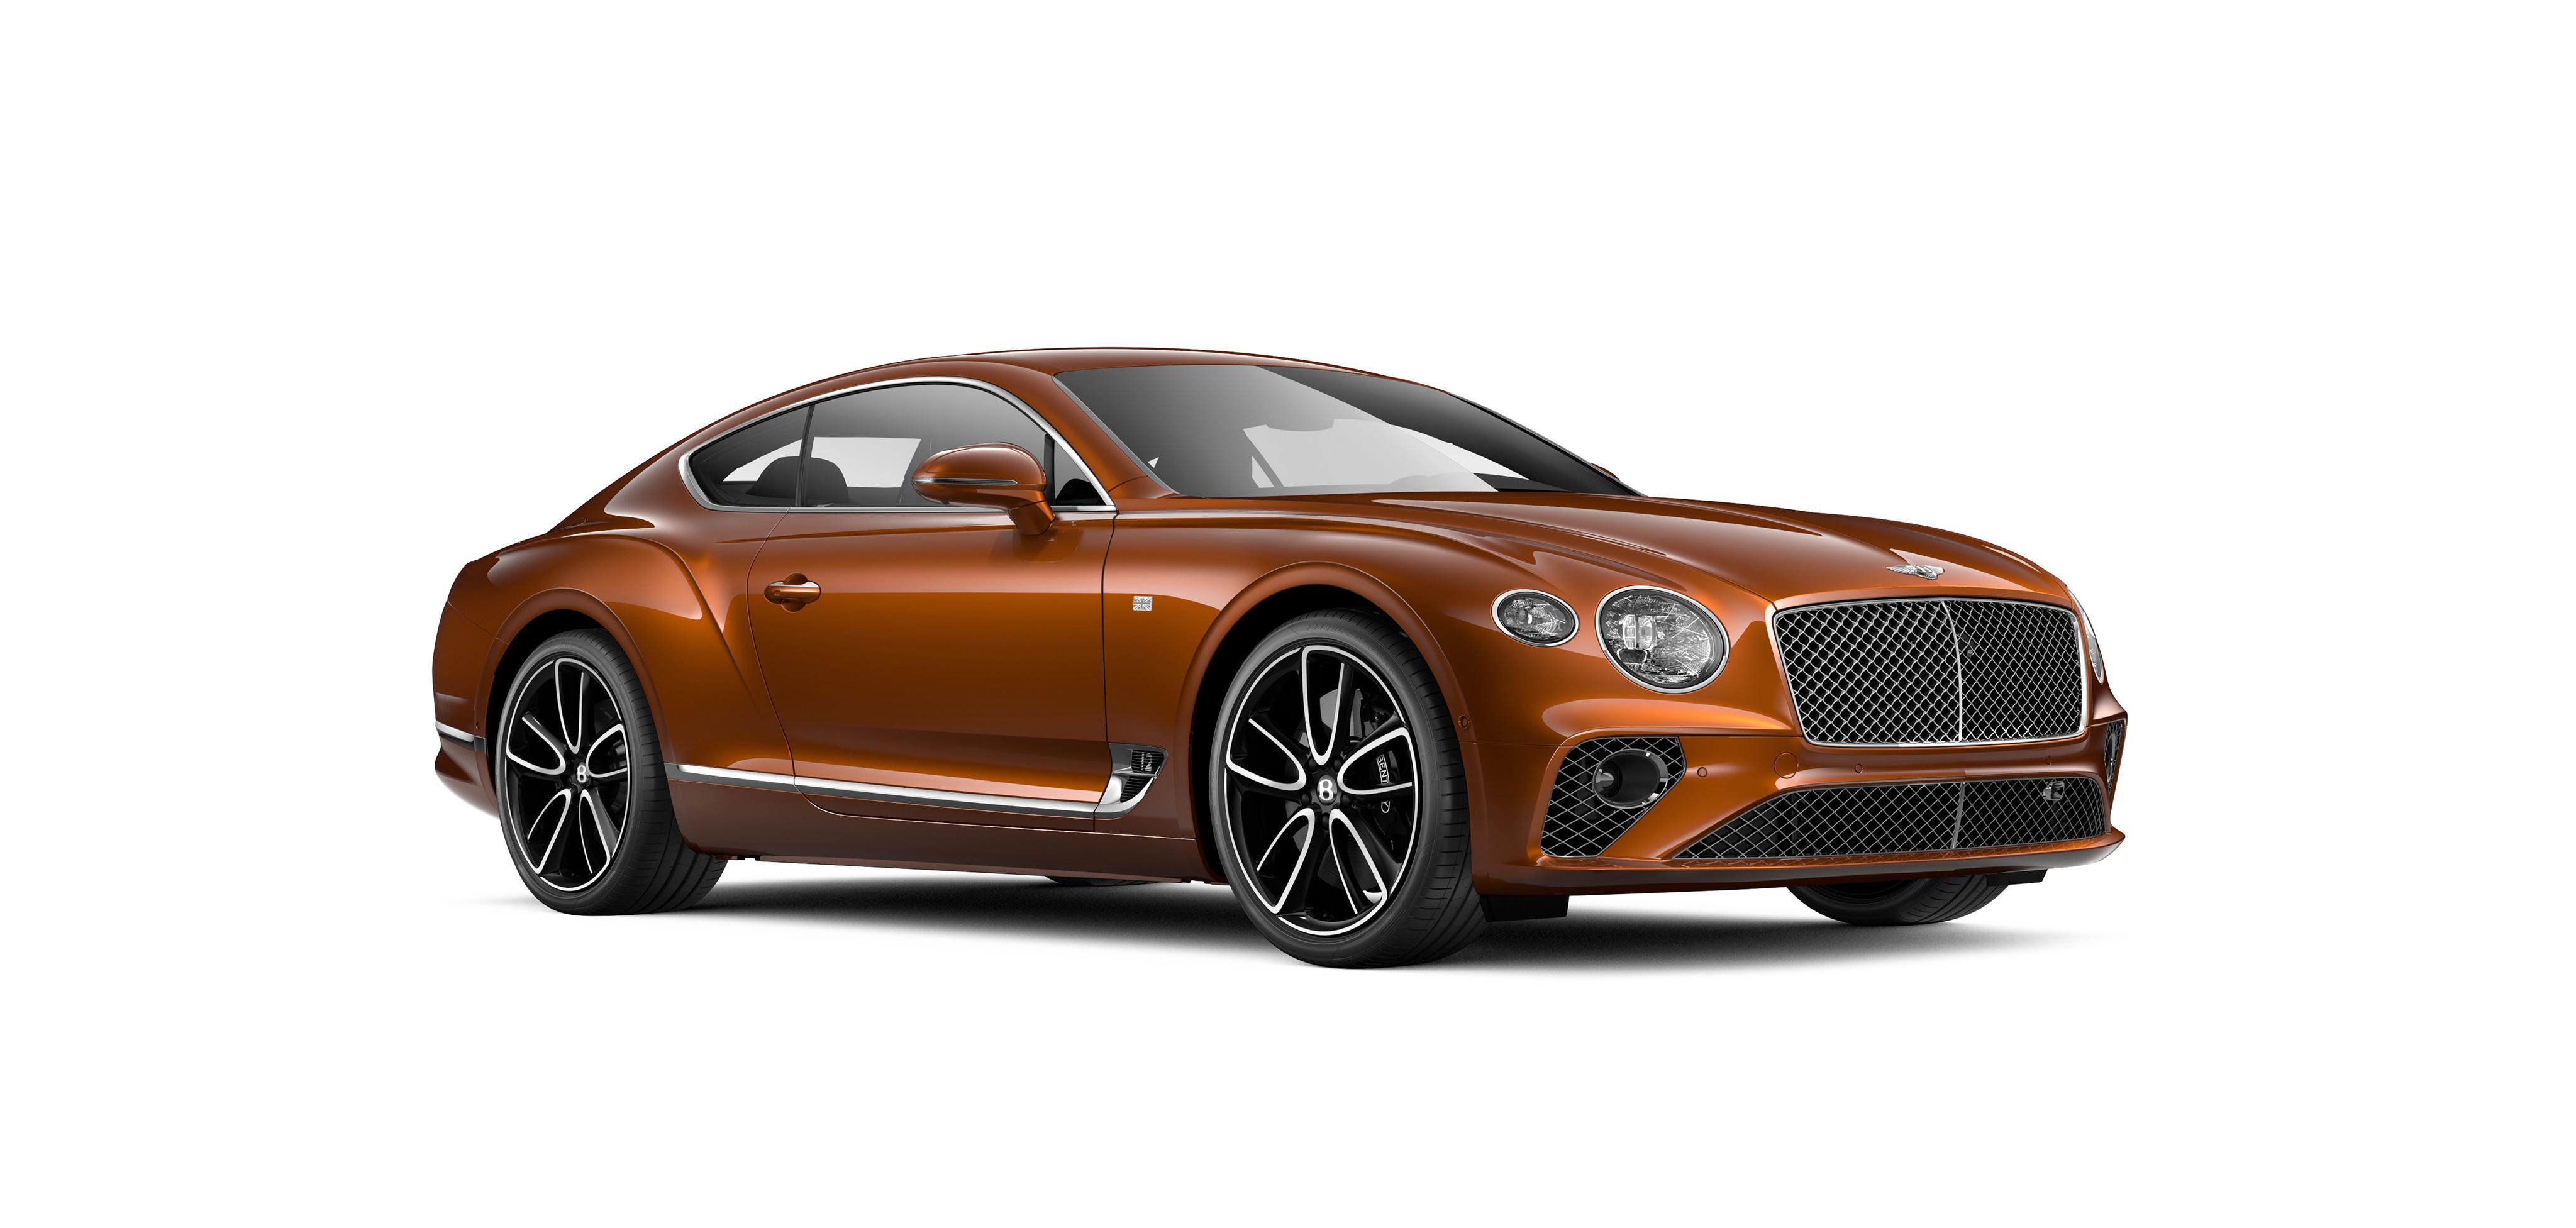 2018 Bentley Continental Gt HD Cars 4k Wallpapers